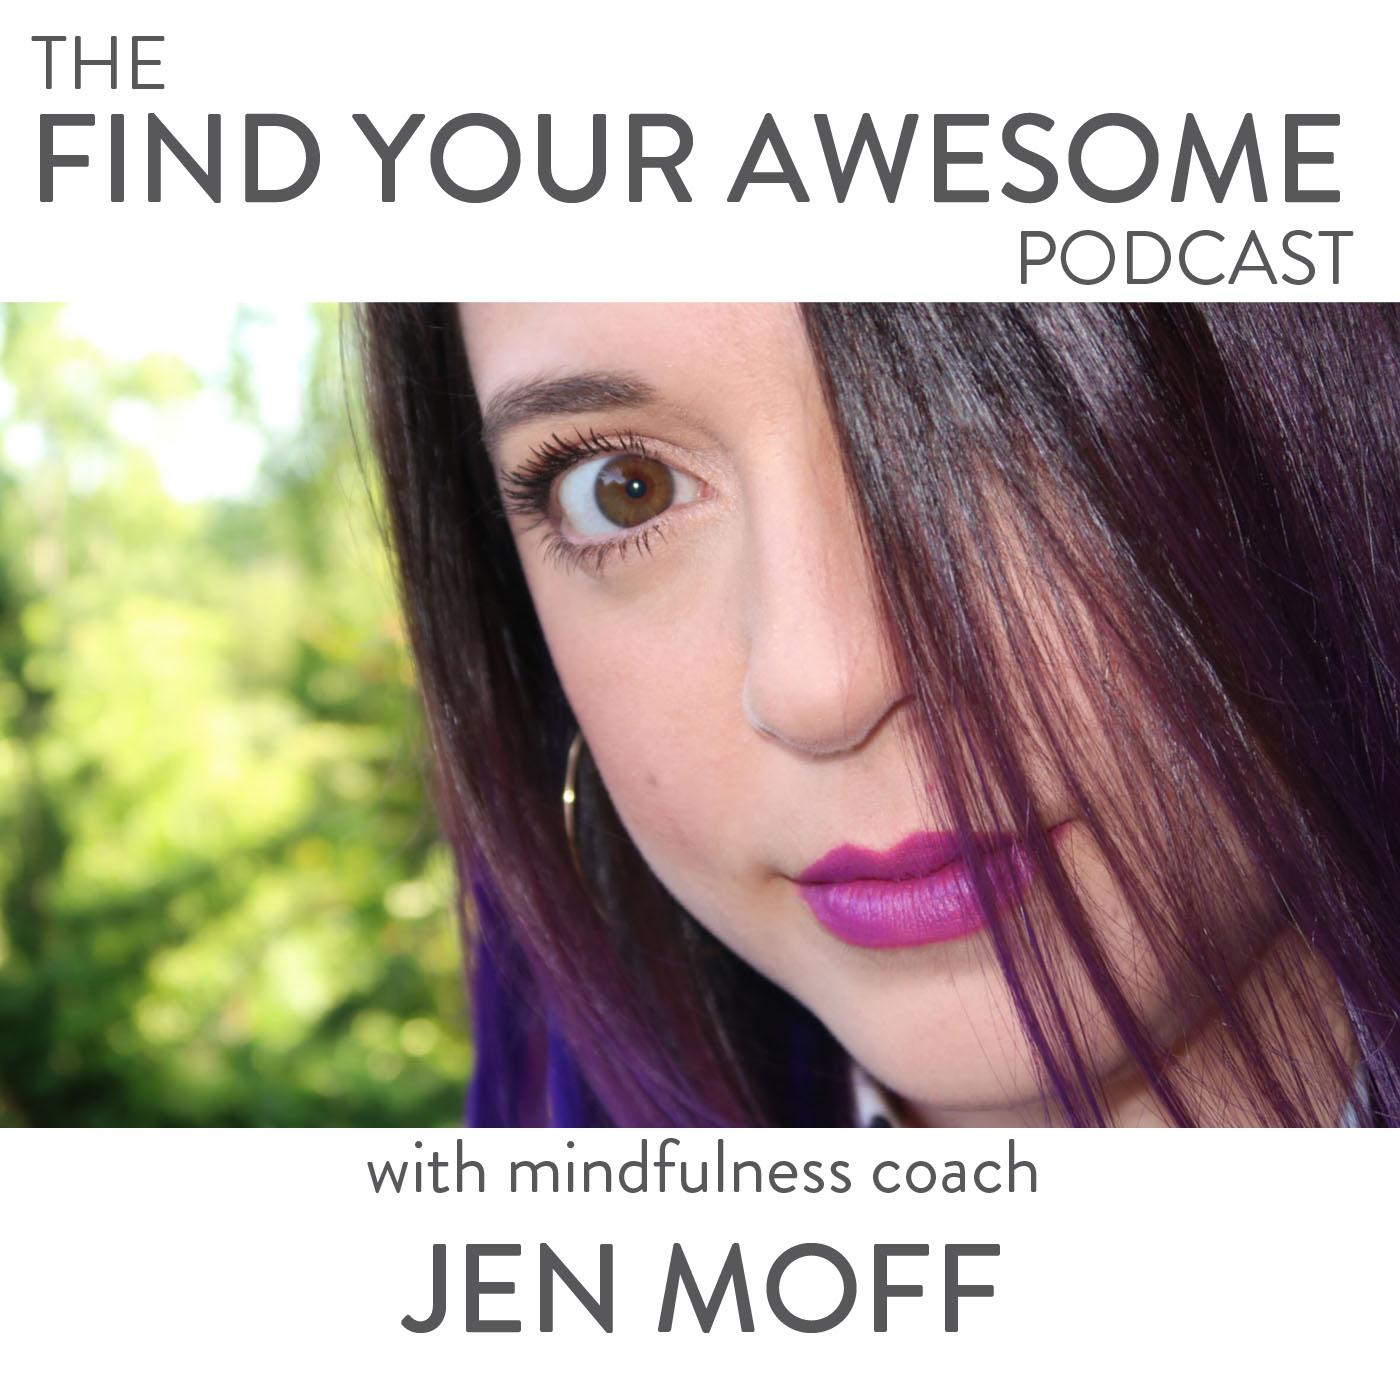 JenMoff_podcast_coverart.jpg